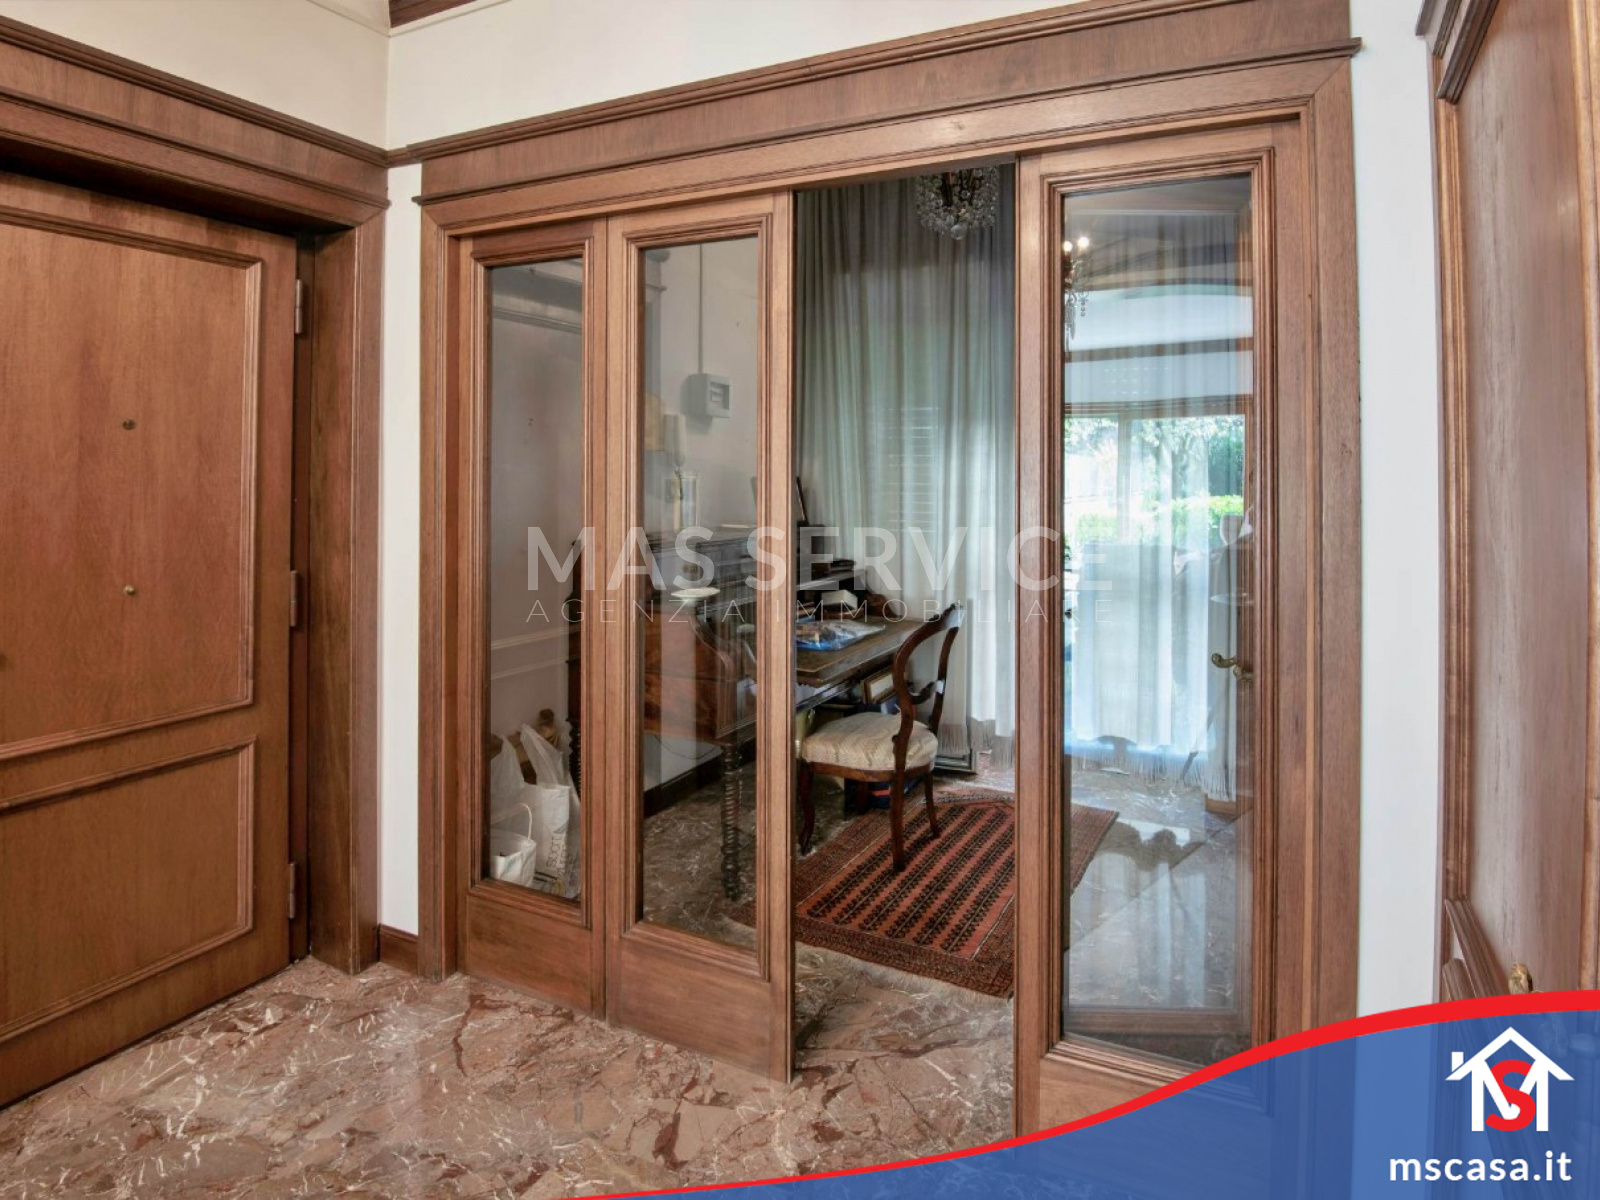 Quadrilocale in vendita zona Laurentina a Roma Vista  Studio da ingresso